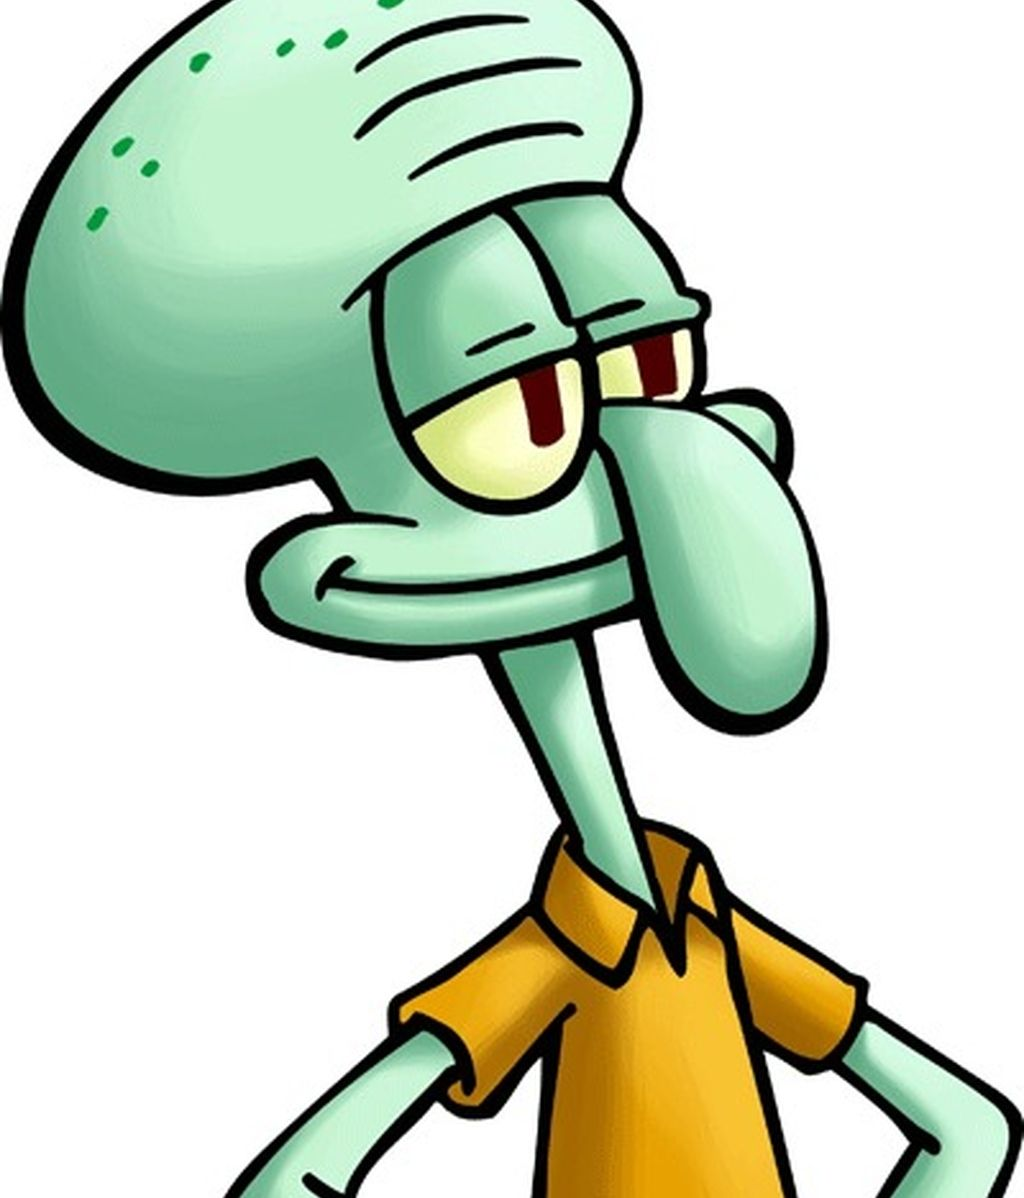 'Bob Esponja' (Nickelodeon)